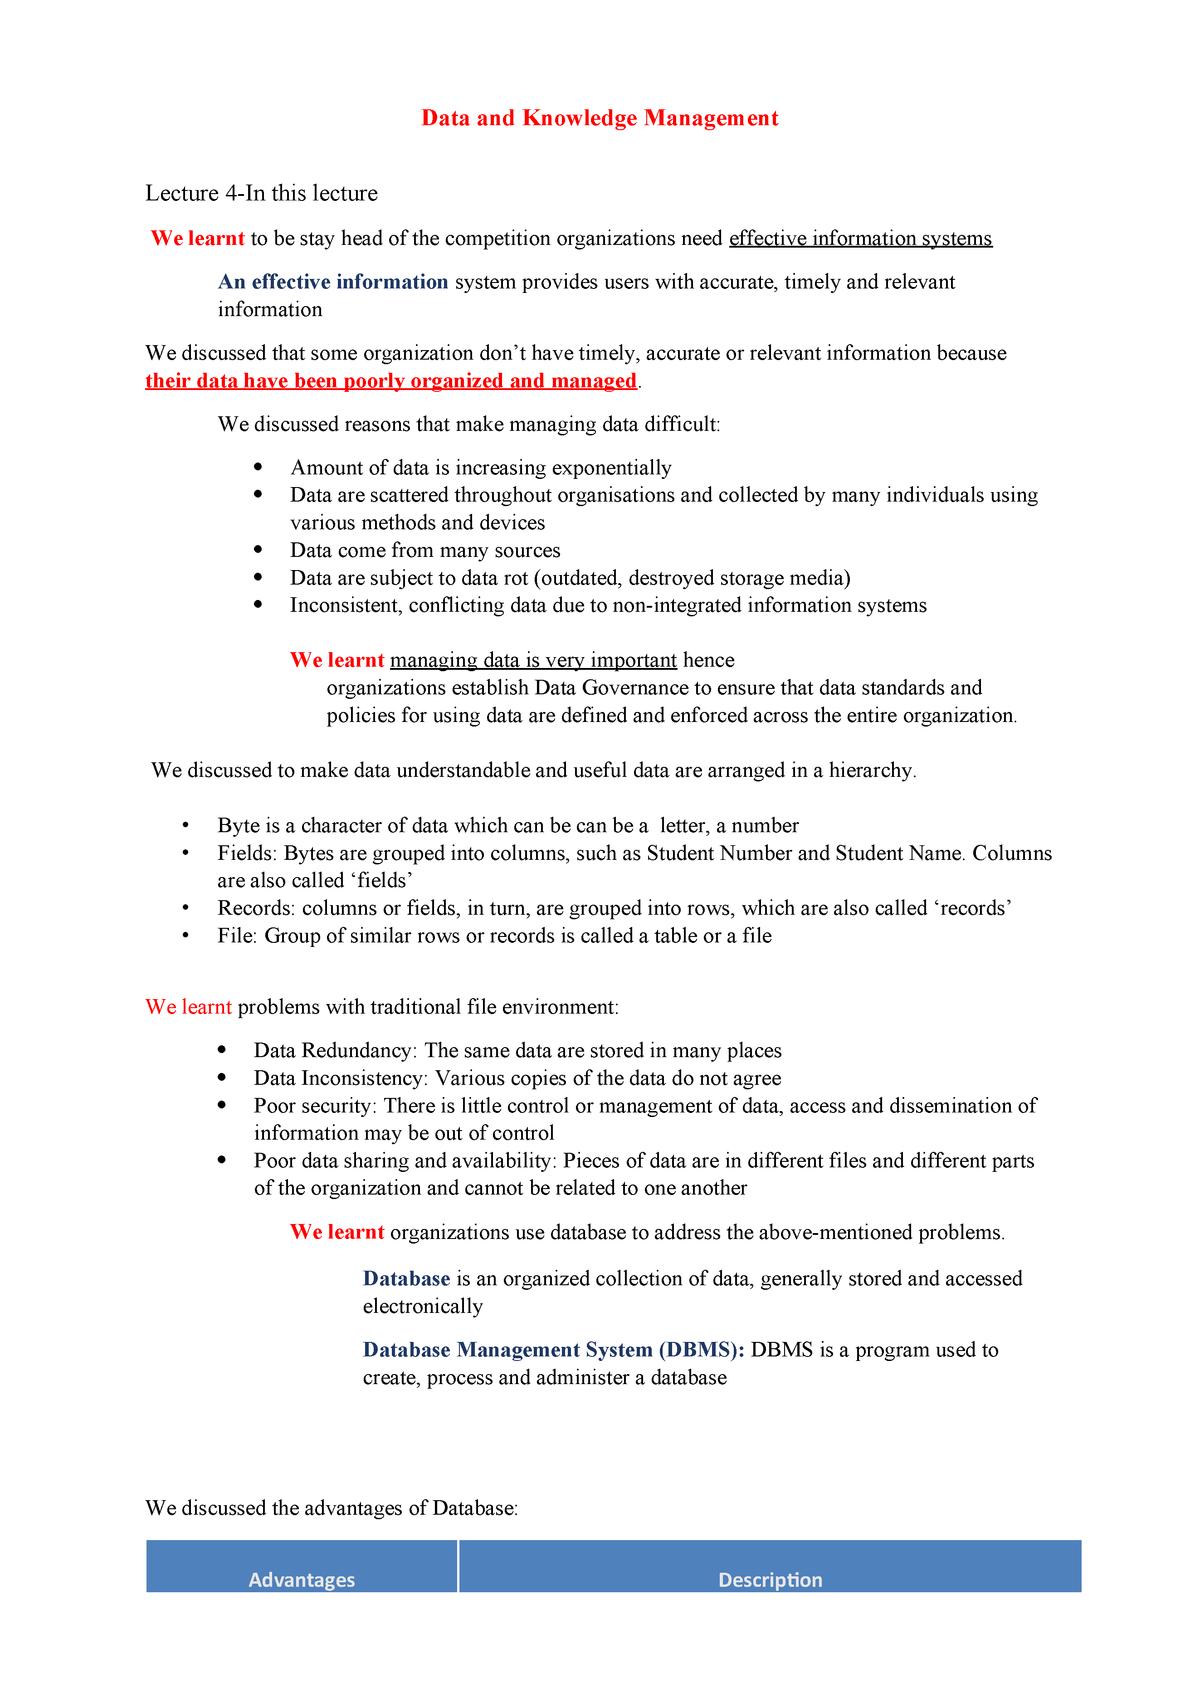 Lecture 4-8Summary(20 - C10219v4 - UTS - StuDocu